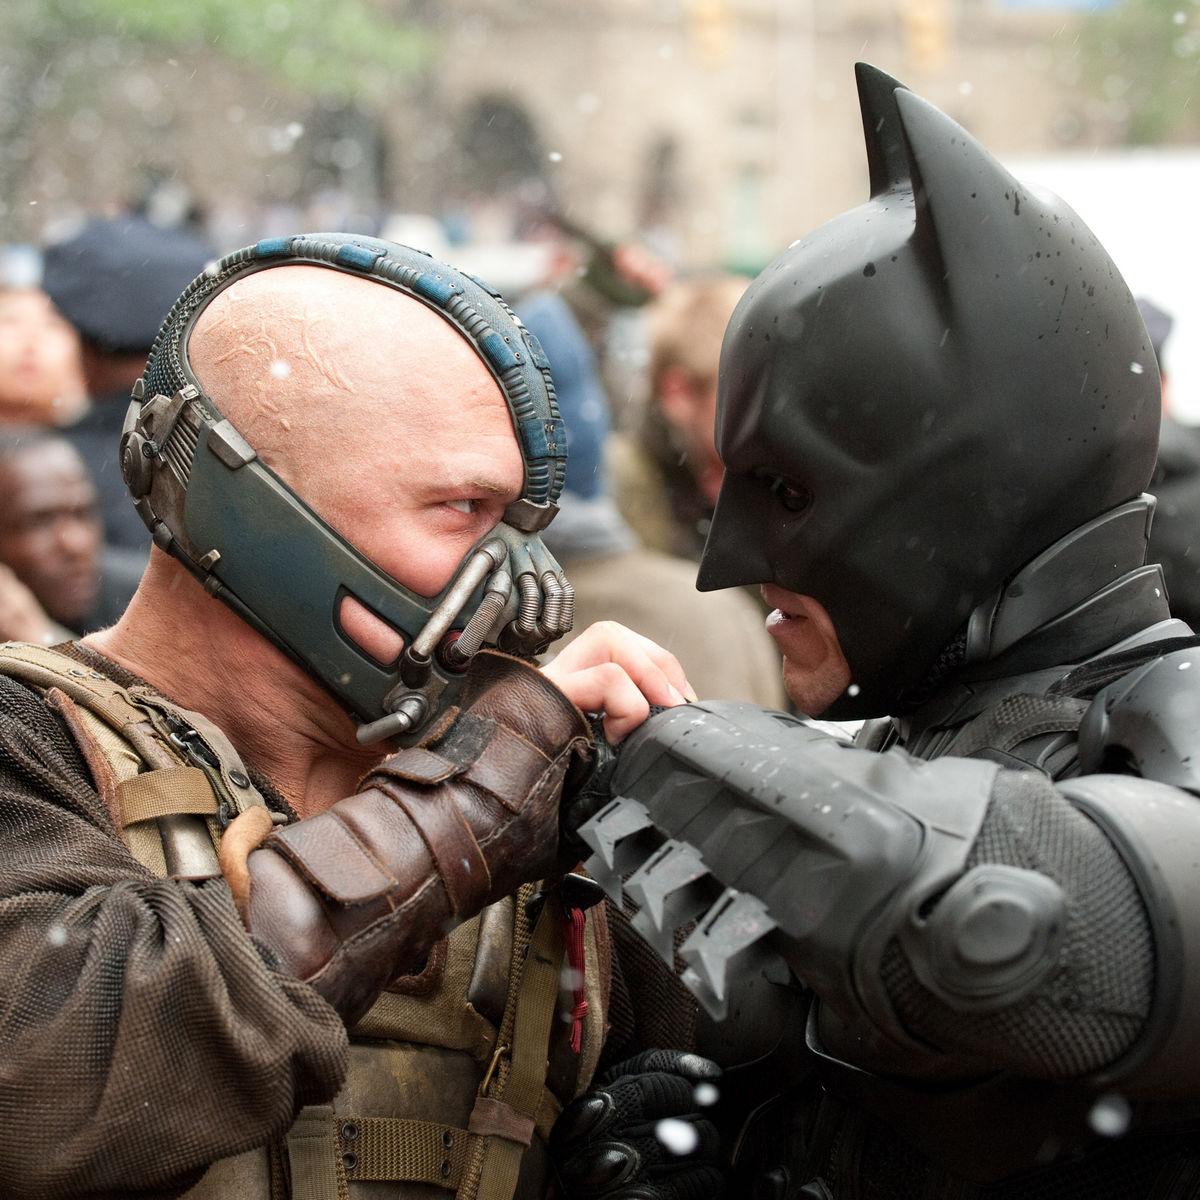 Tom-Hardy-as-Bane-in-The-Dark-Knight-Rises-HQ-bane-30727972-2560-2029.jpg